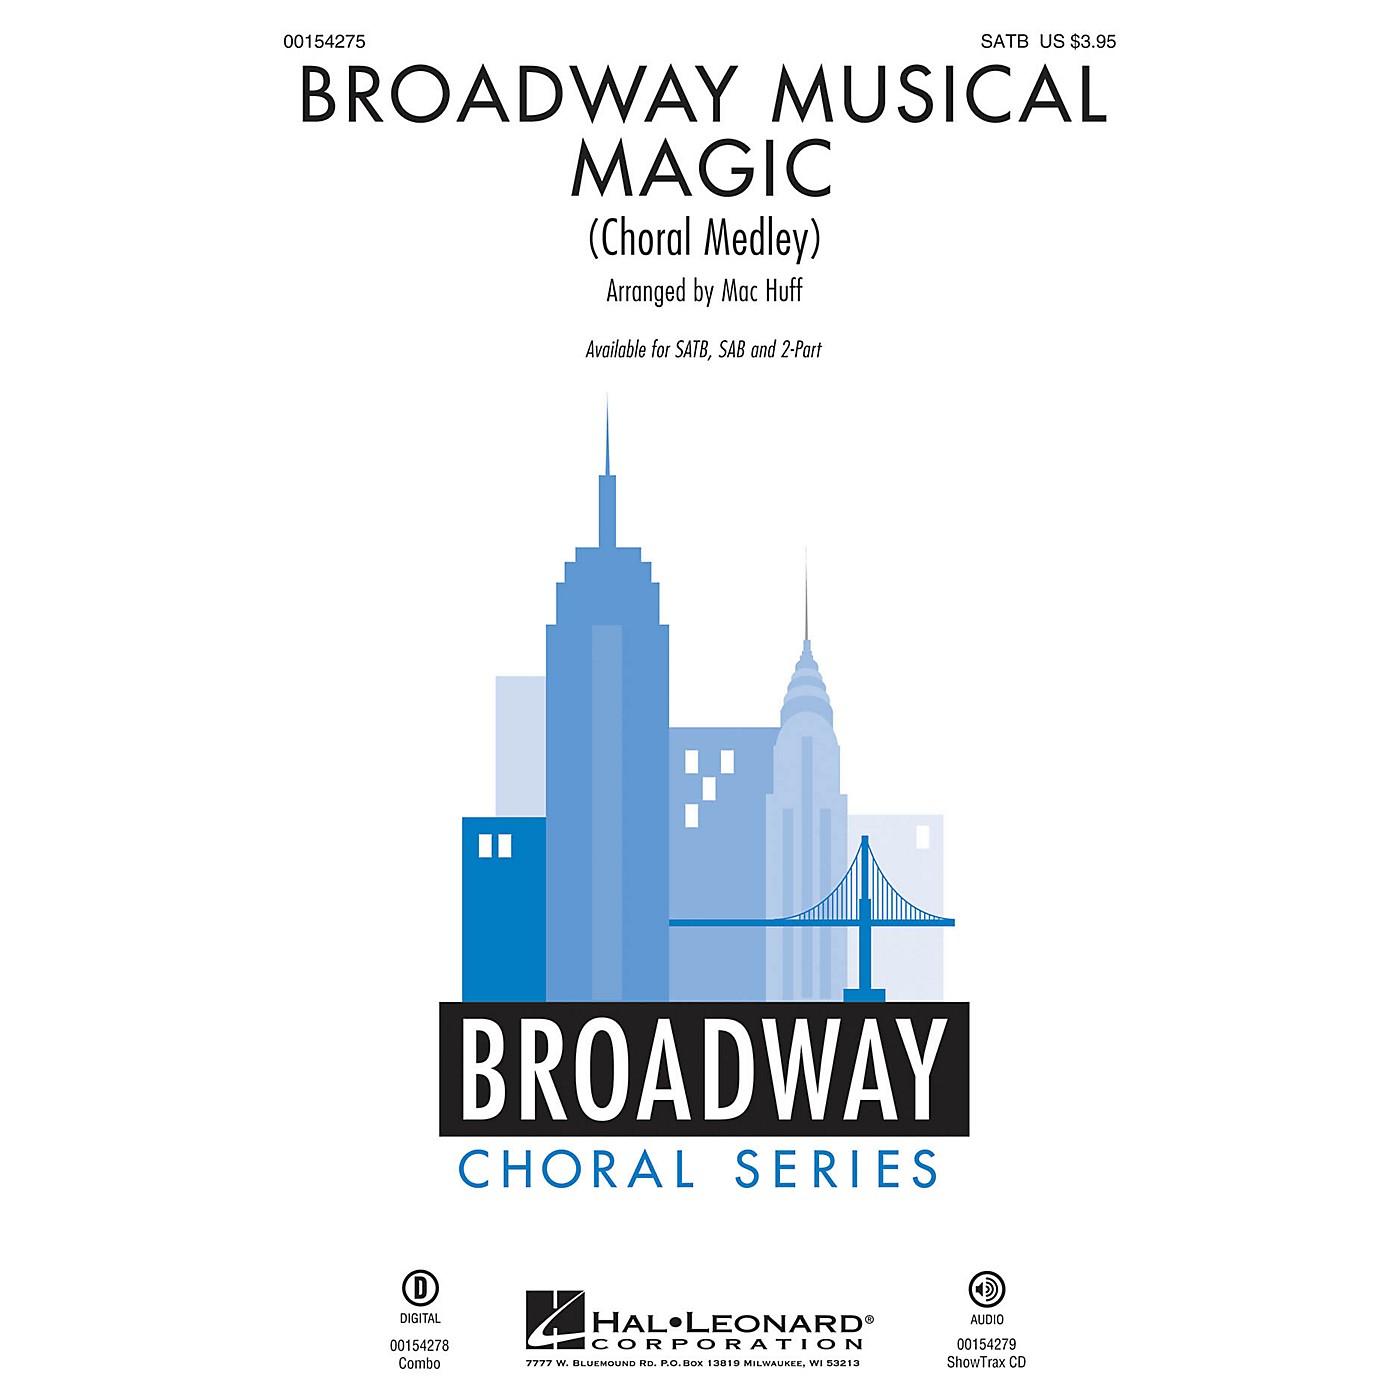 Hal Leonard Broadway Musical Magic (Choral Medley) SATB arranged by Mac Huff thumbnail